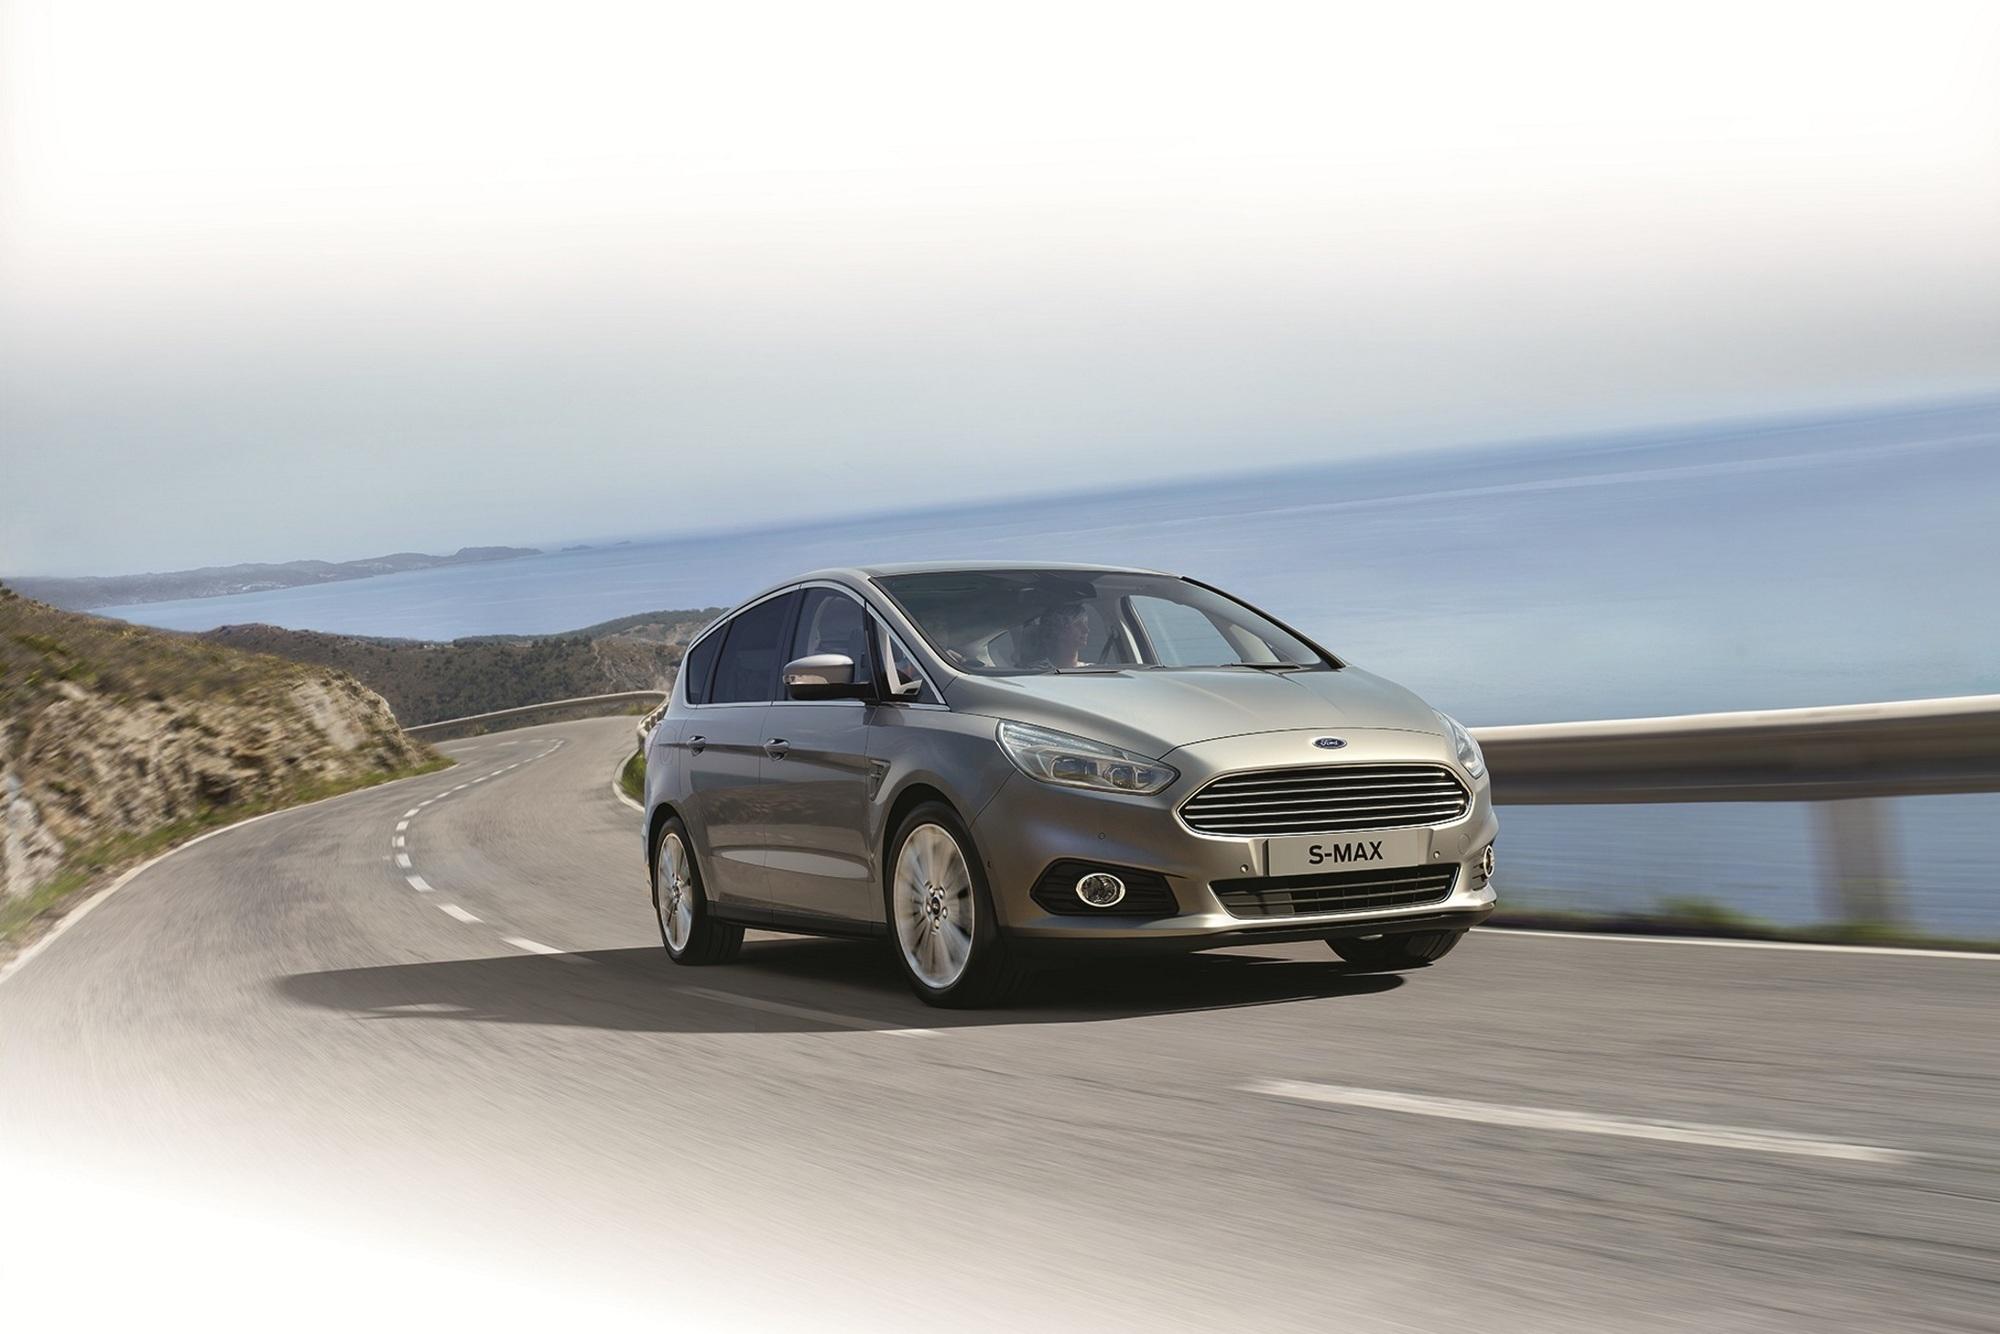 Fahrbericht: Ford S-Max - Gut statt sportlich